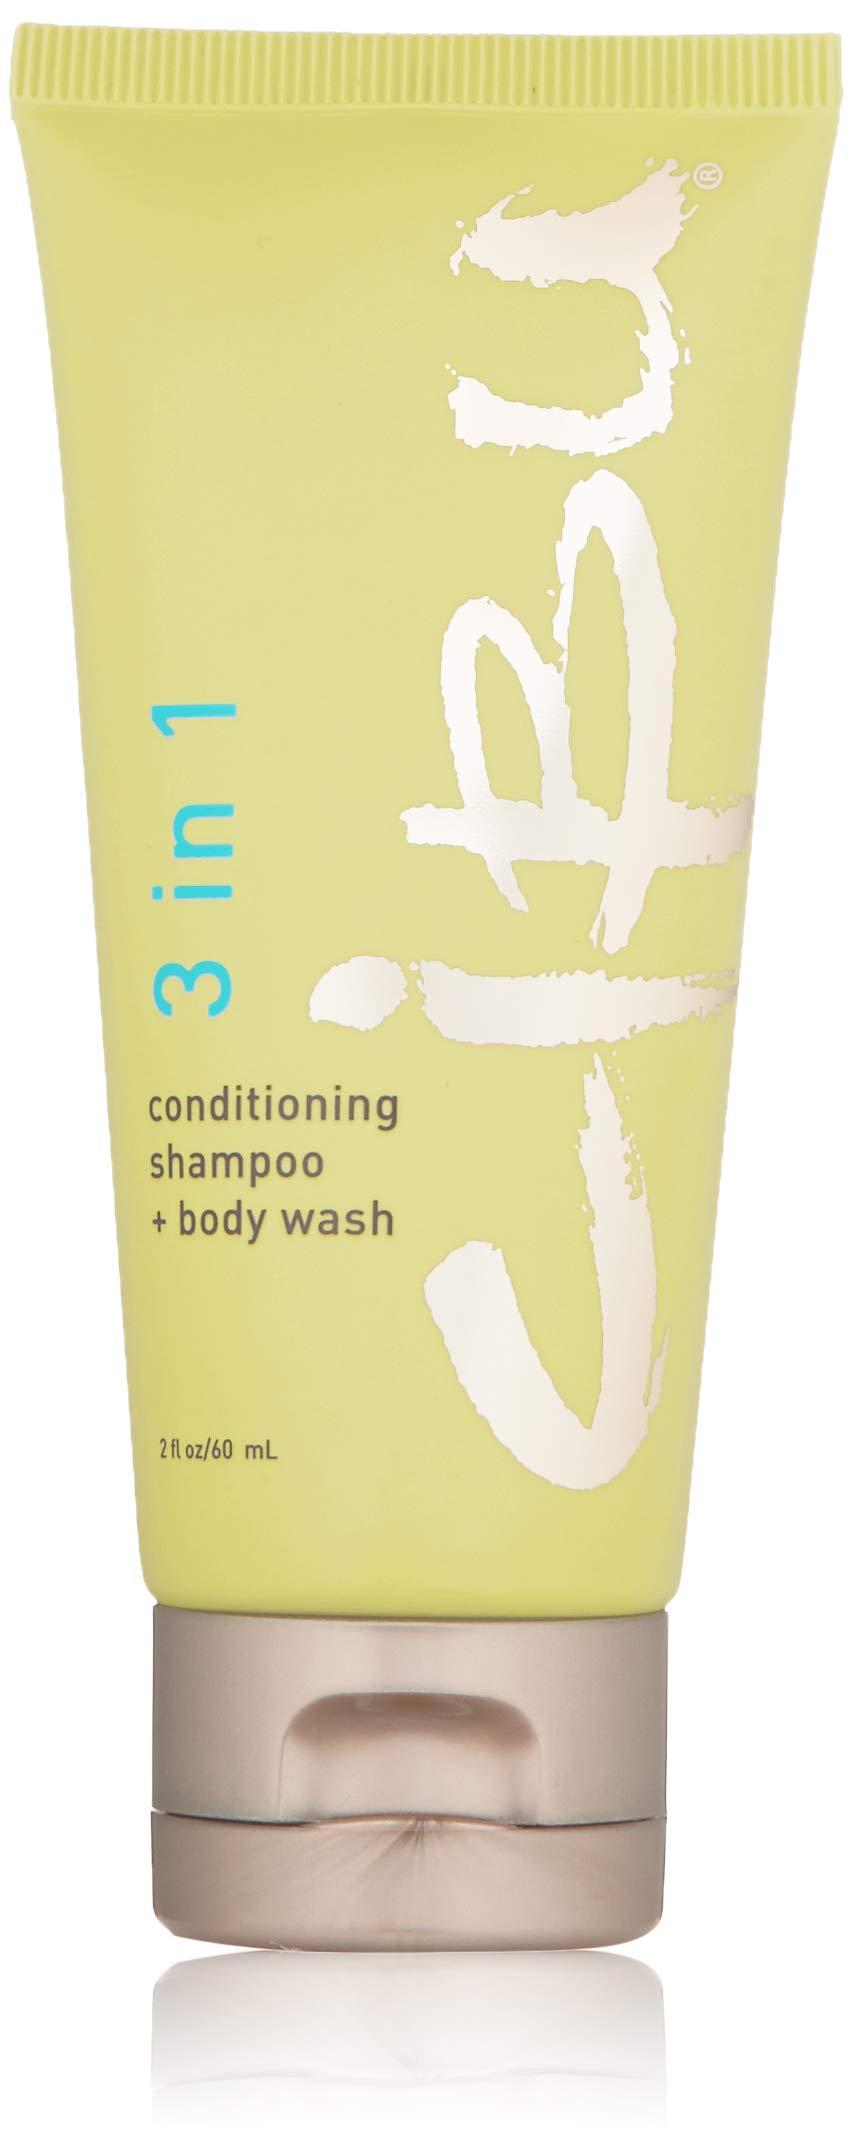 CIBU 3 in 1 Conditioning Shampoo + Body Wash Travel Size, 2 Fl Oz